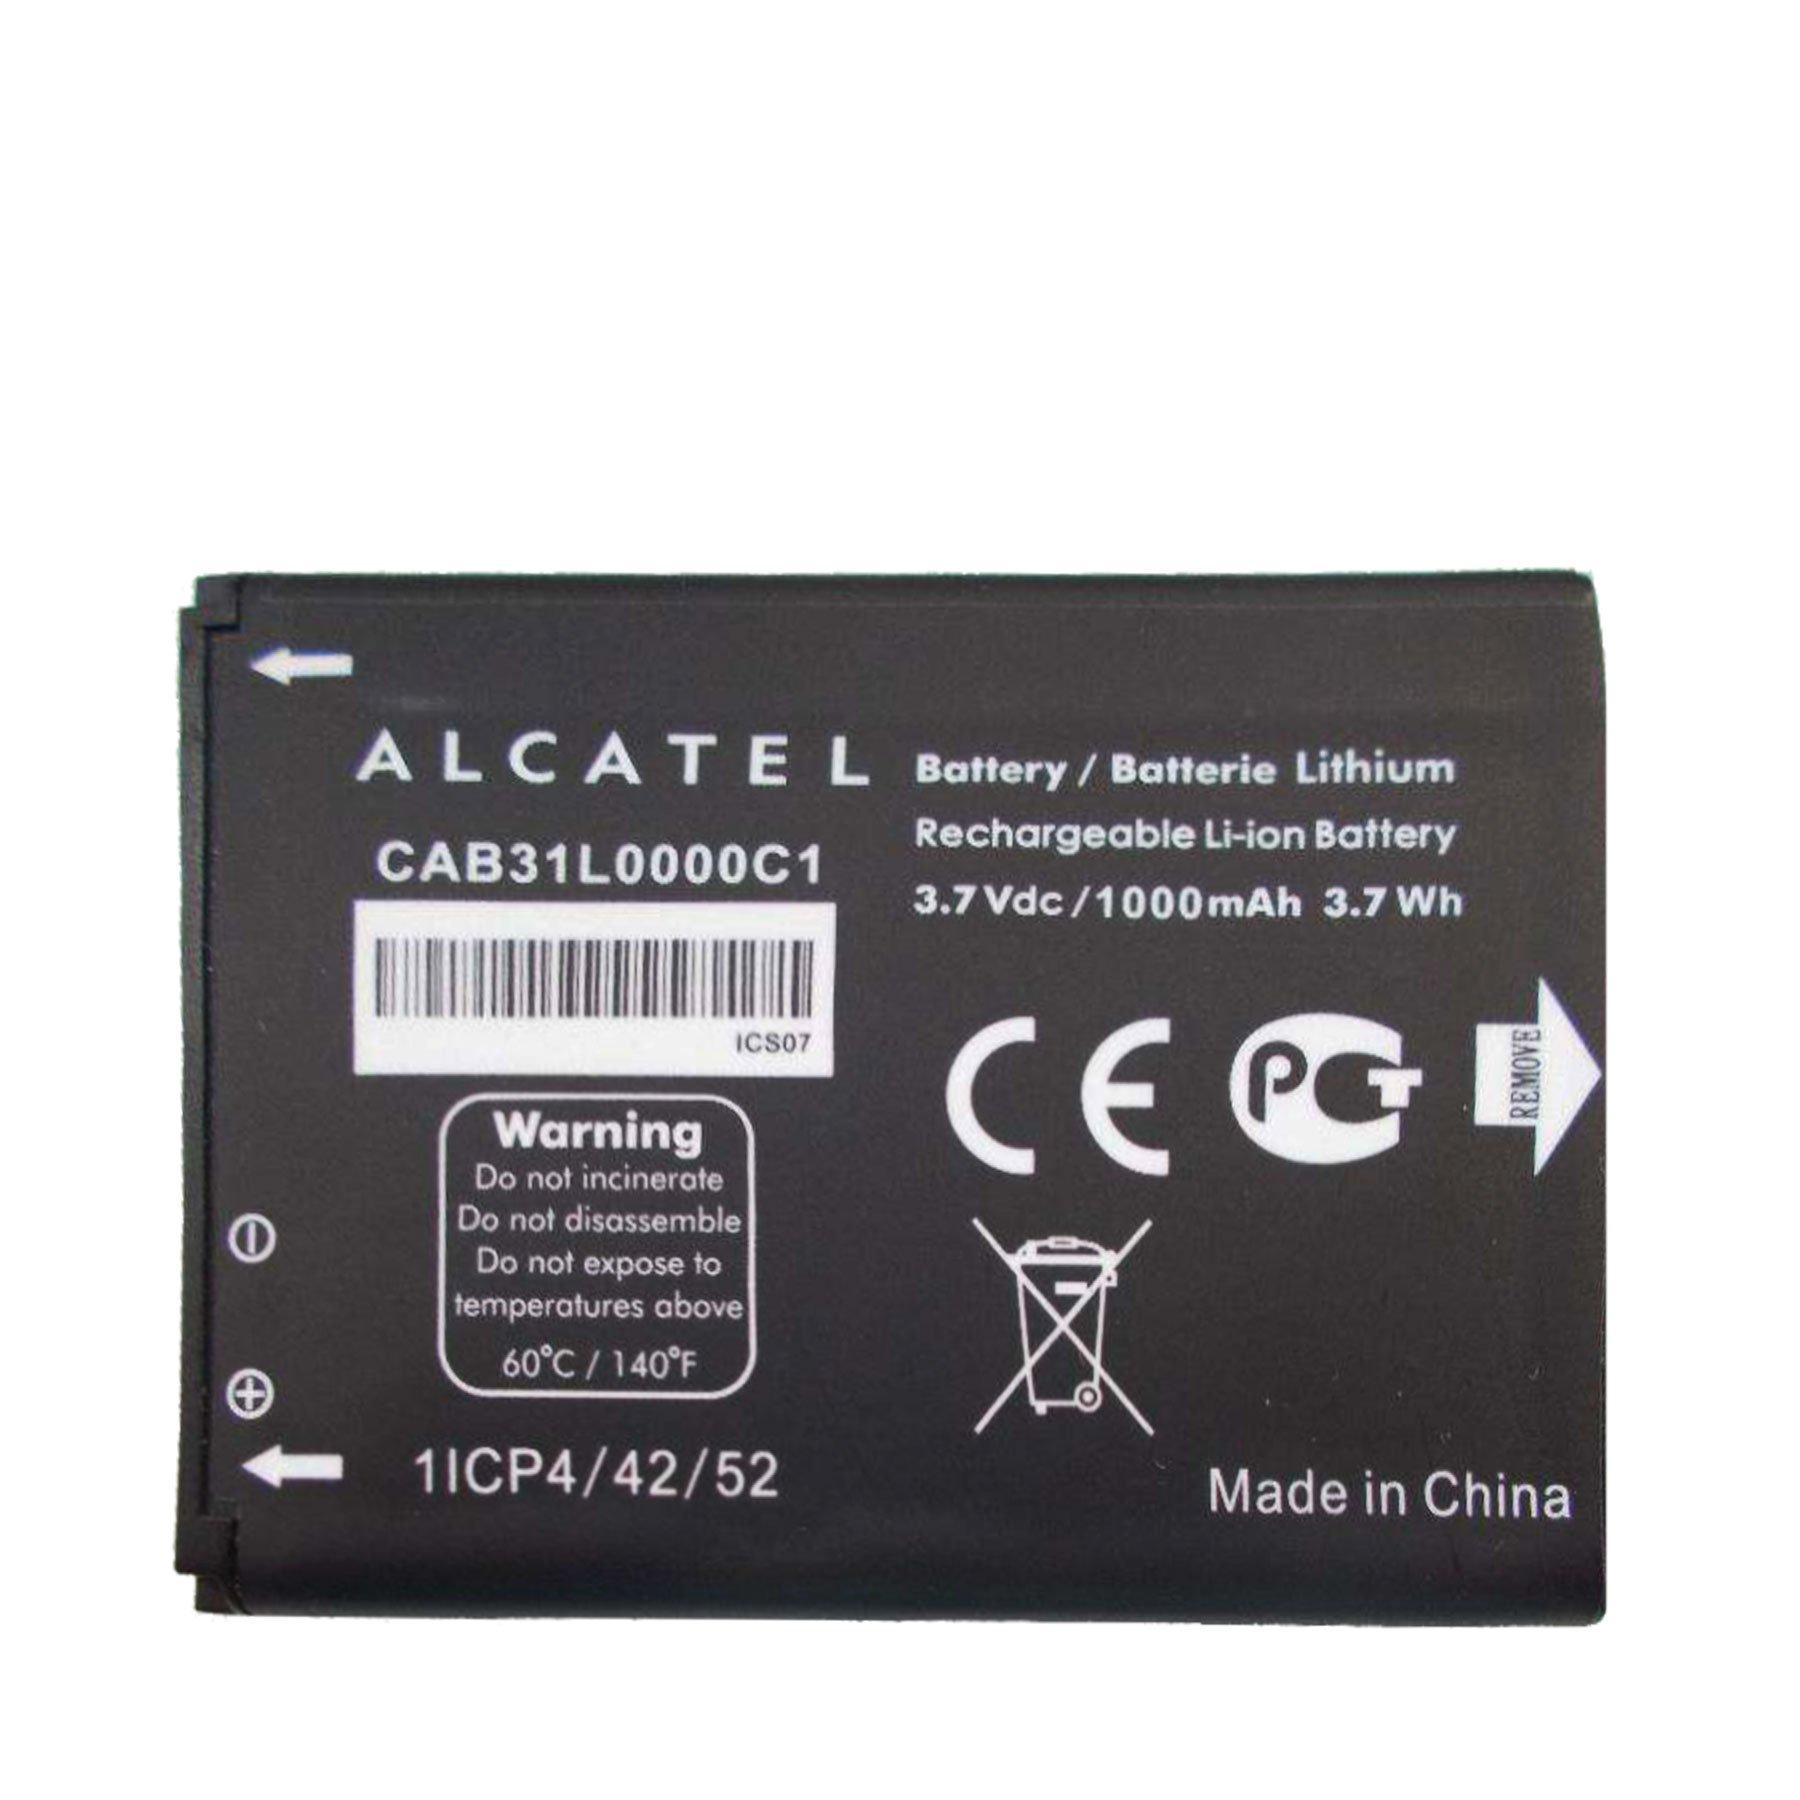 ALCATEL GLITZY GIZMOS® GENUINE CAB31L0000C1 1000mAh 3.7V 3.7Wh BATTERY FOR VODAFONE 555 / VF555 / VF155 / OT-891 ONE TOUCH 891 (None Retail Packaging)